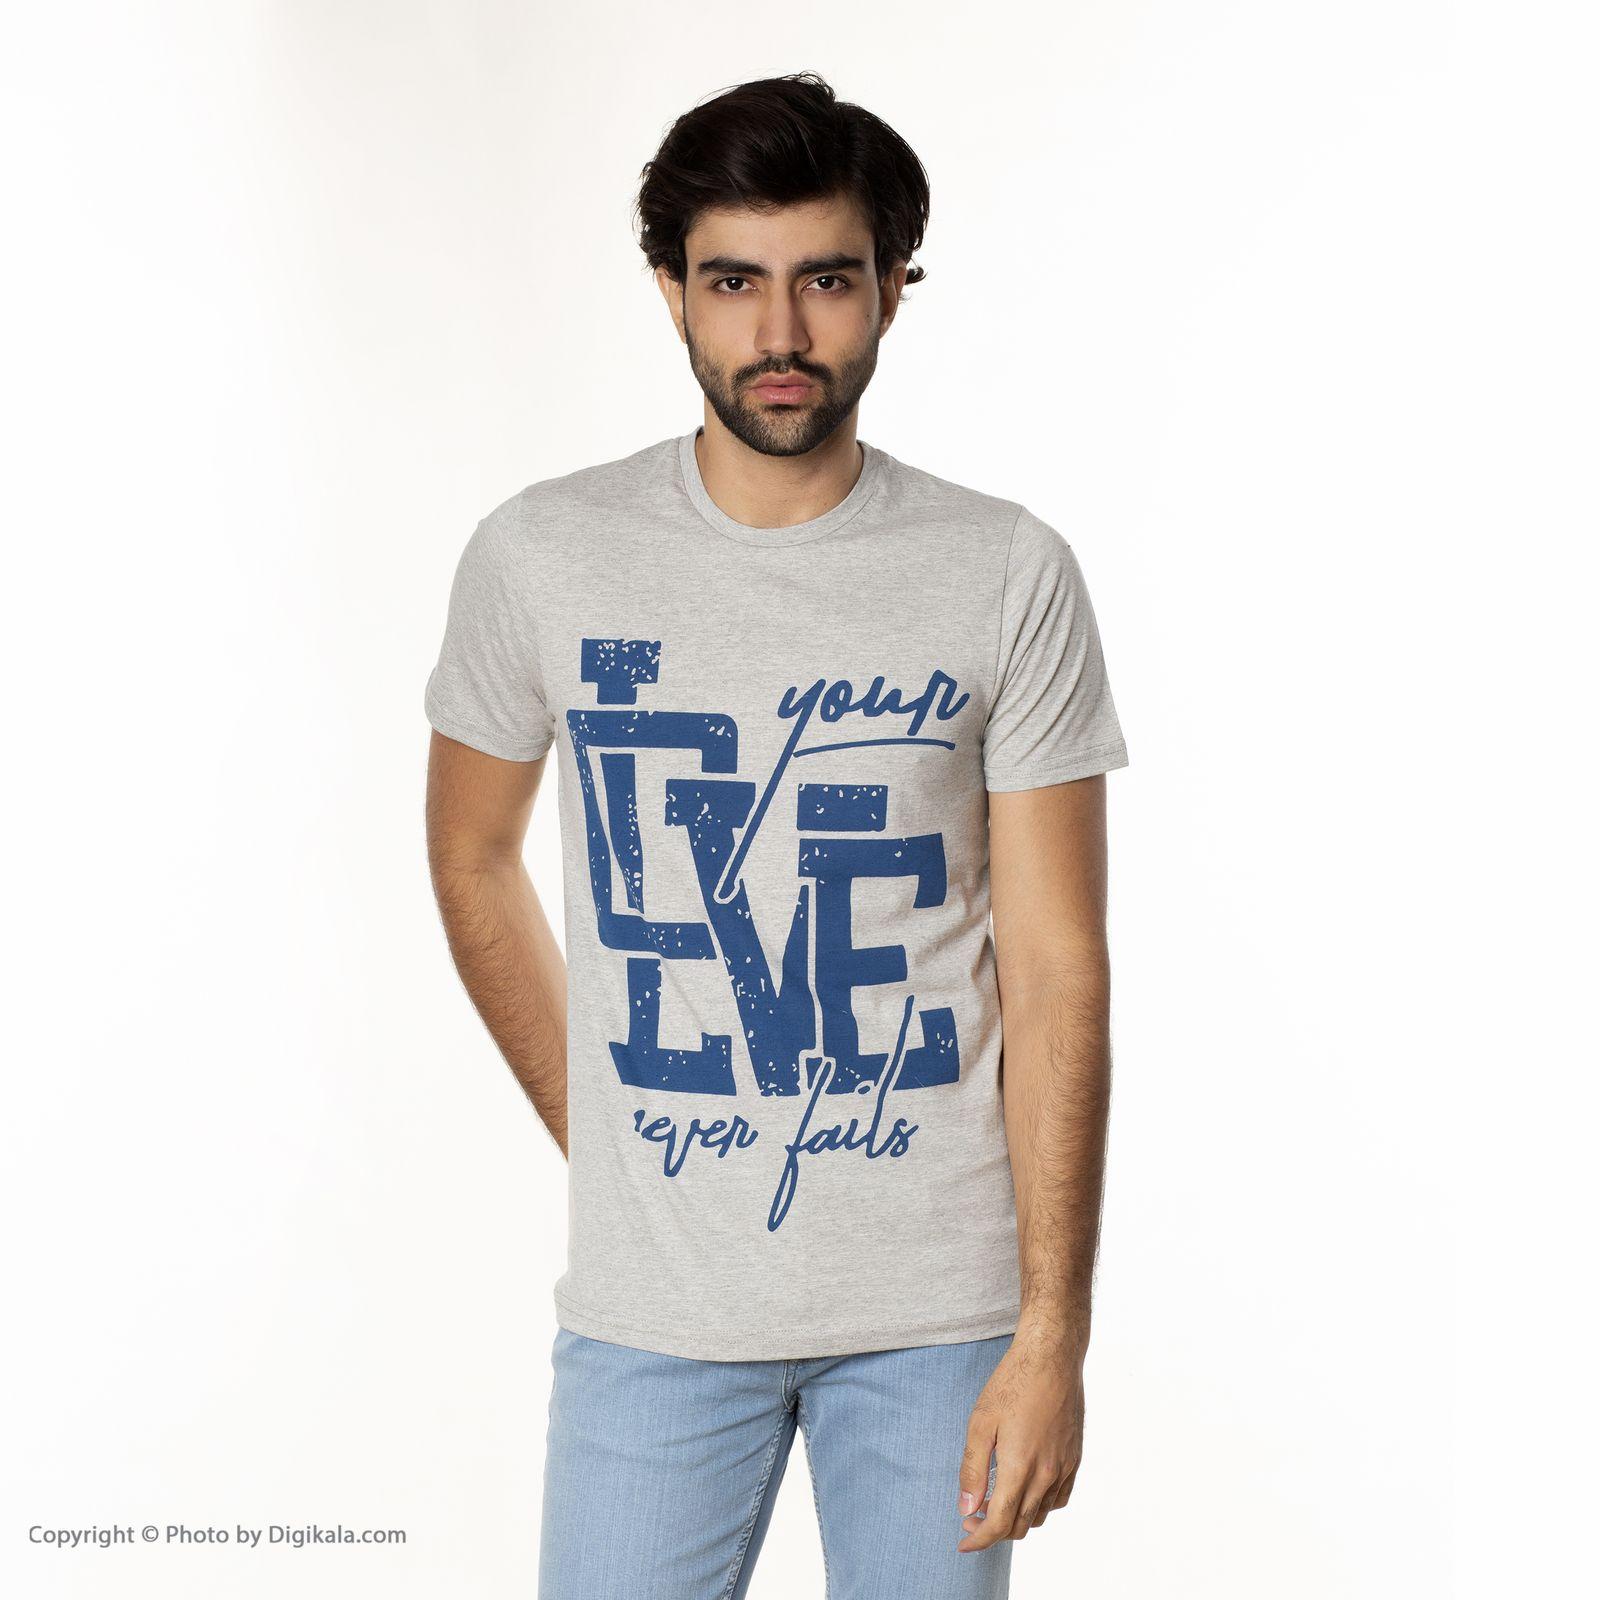 تیشرت مردانه آر اِن اِس مدل 12020956-93 -  - 10